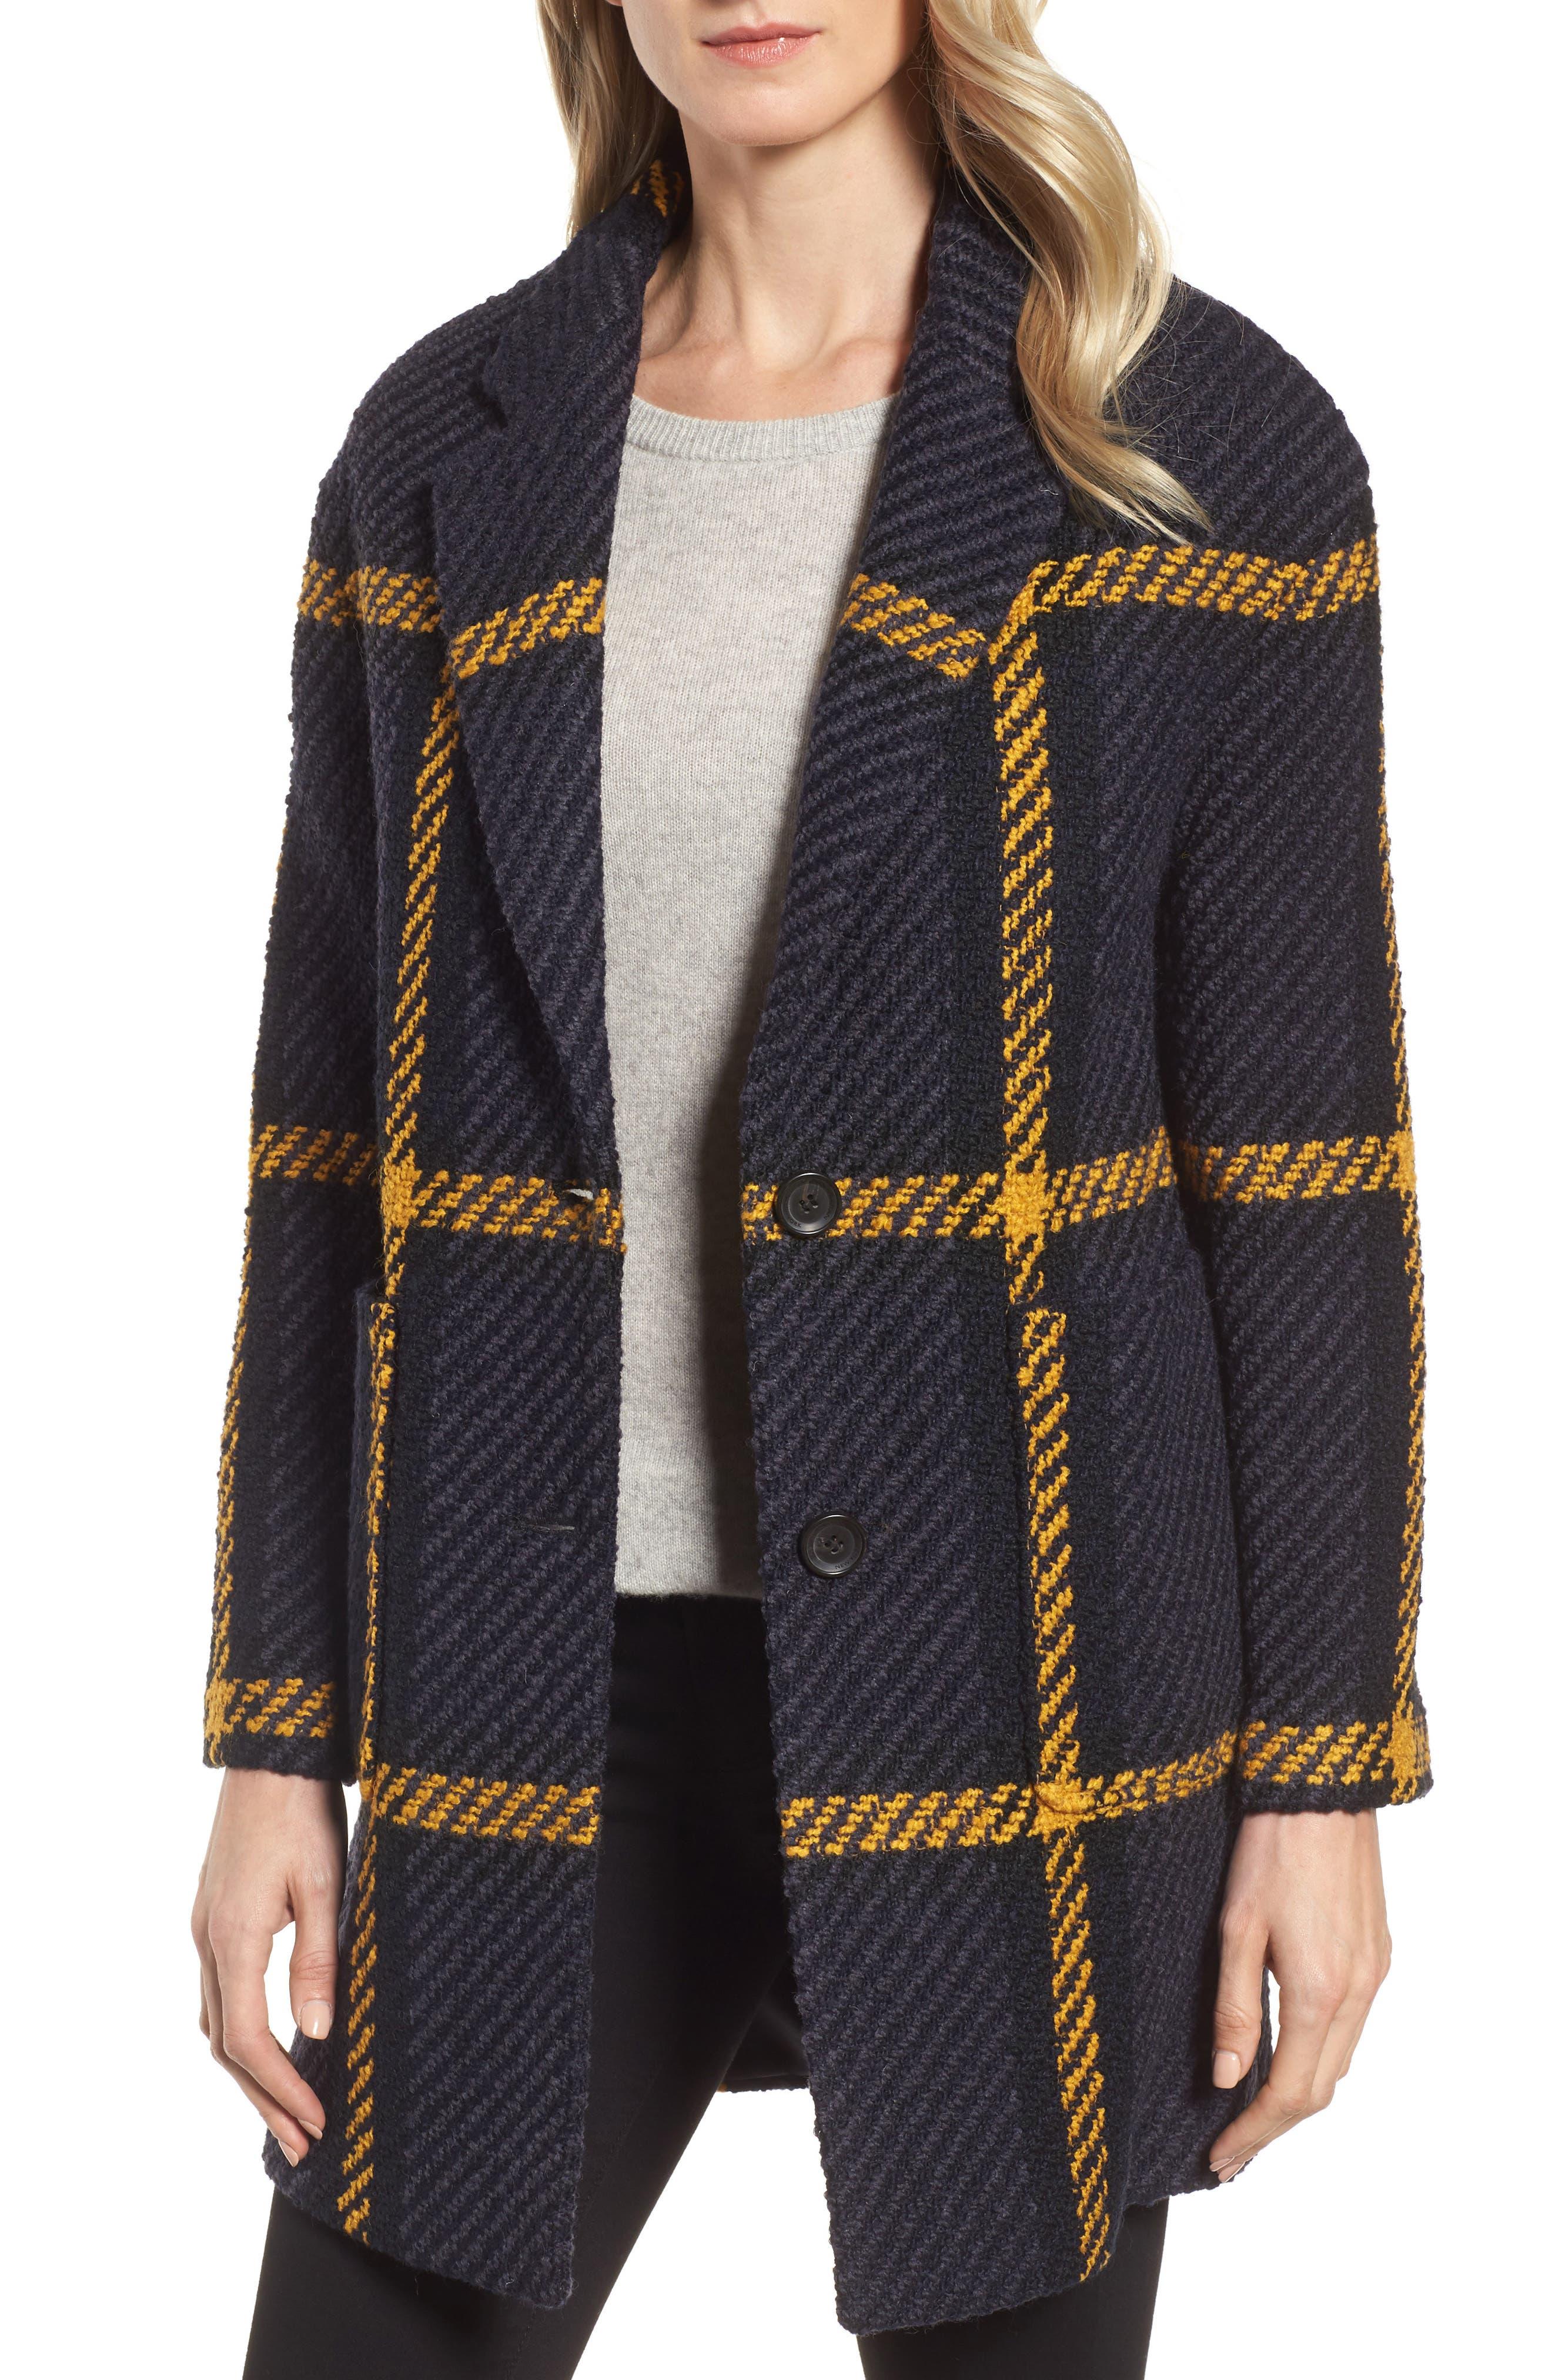 DKNY Textured Plaid Wool Blend Coat